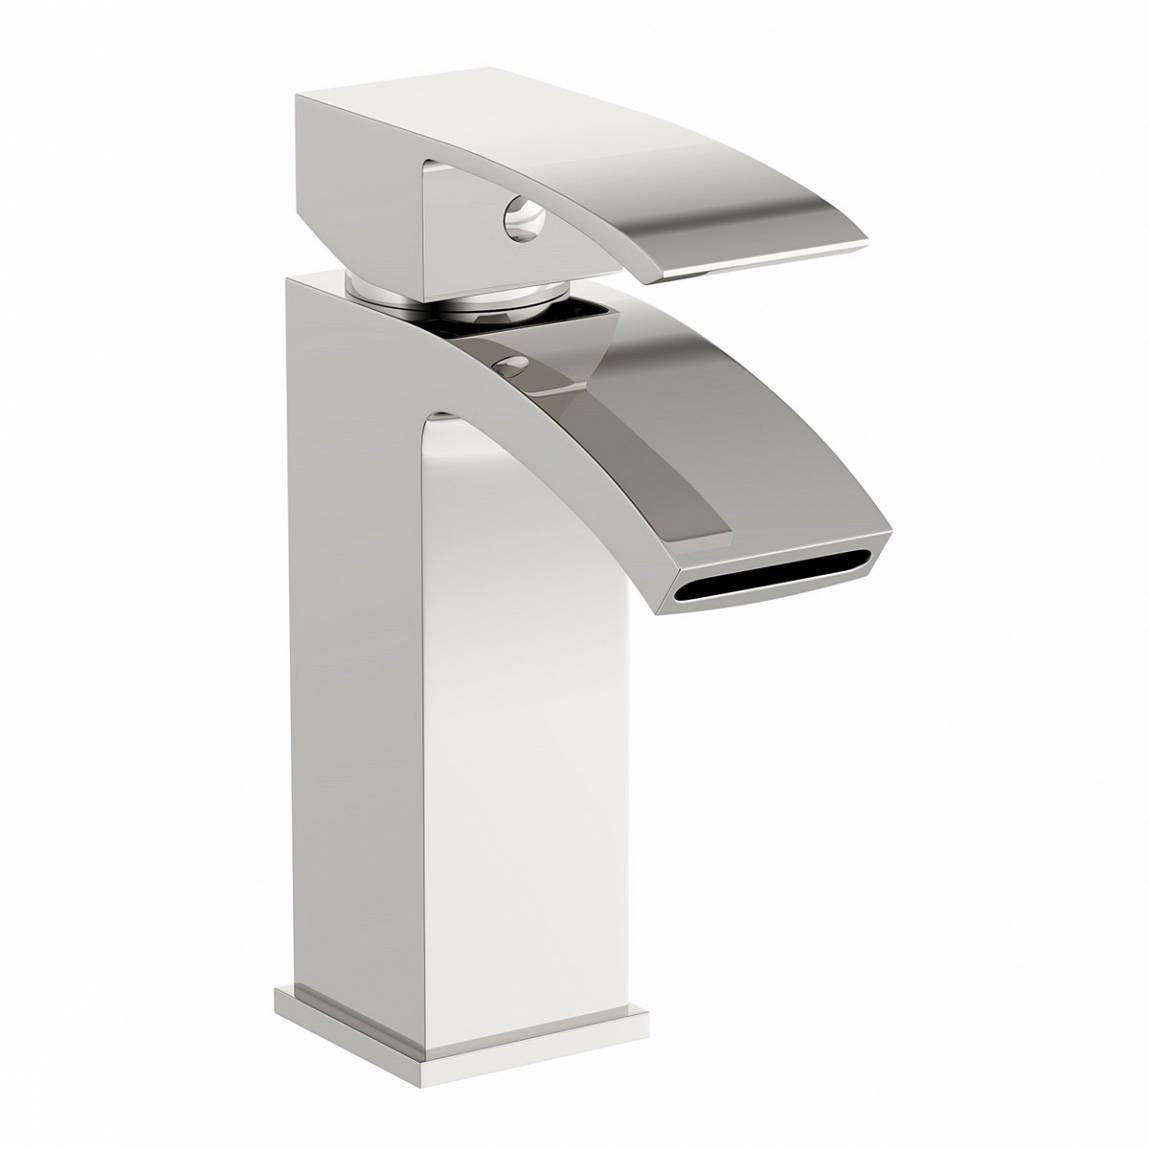 Orchard Wye basin mixer tap